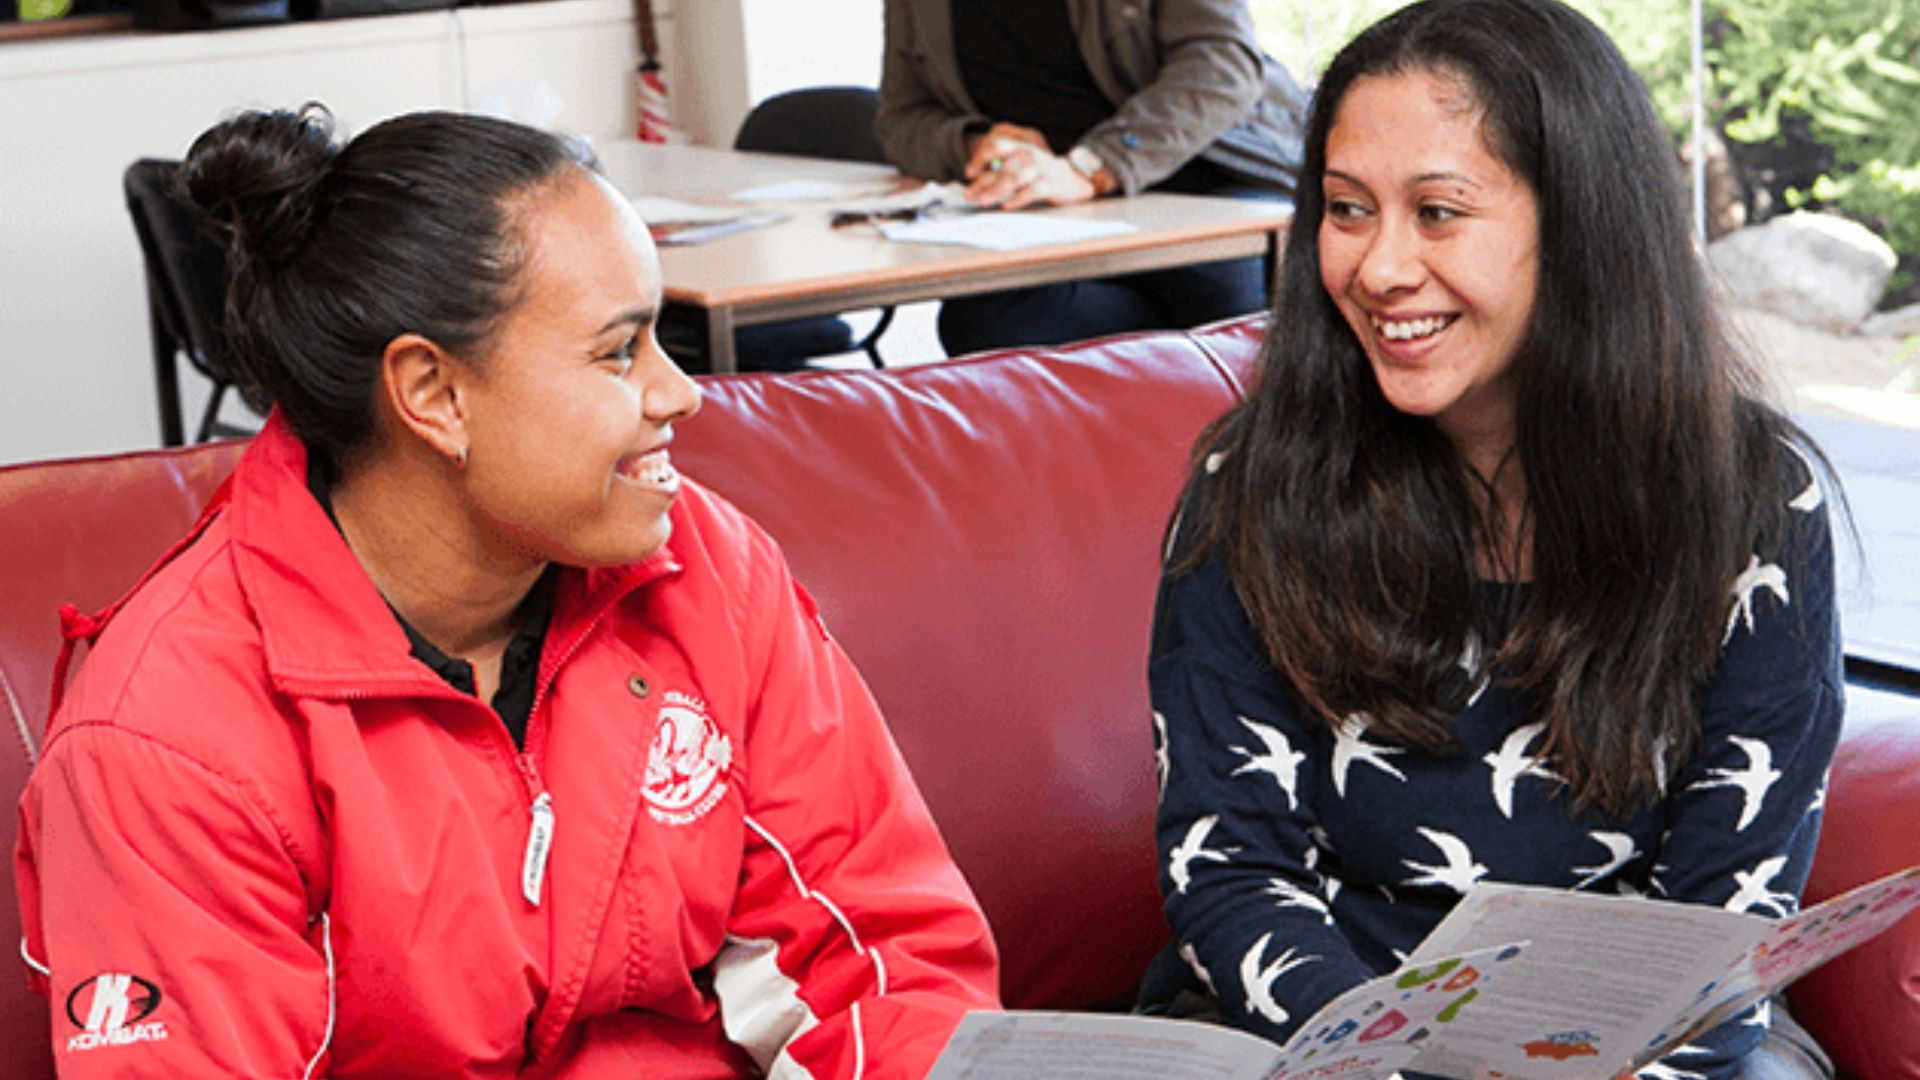 Charles Sturt offers free university preparation program for prospective Indigenous students